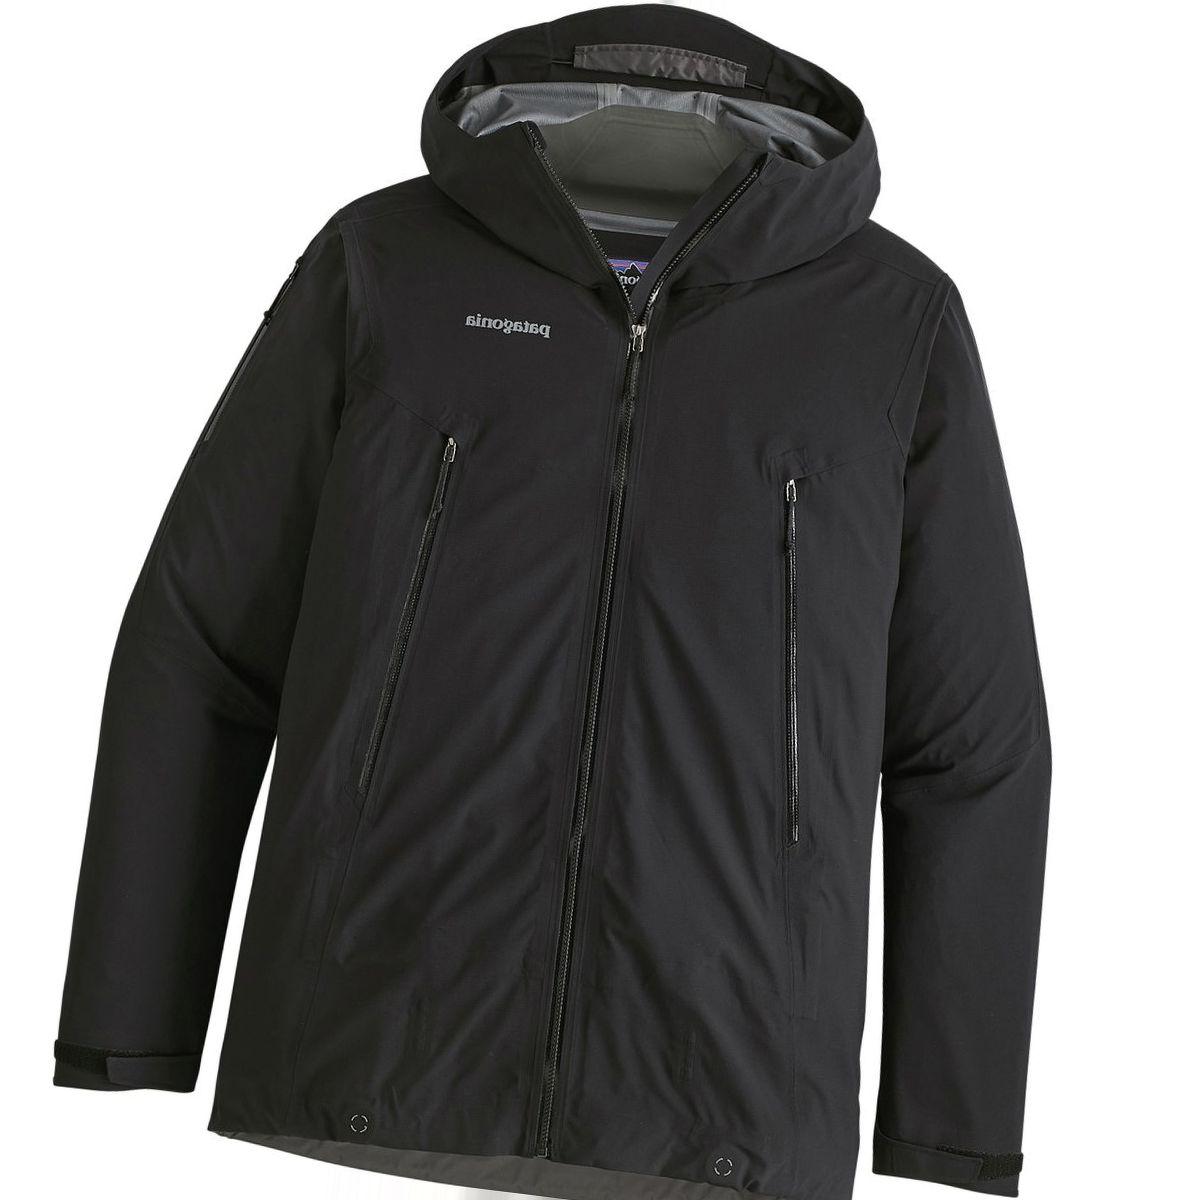 Patagonia Descensionist Jacket - Men's